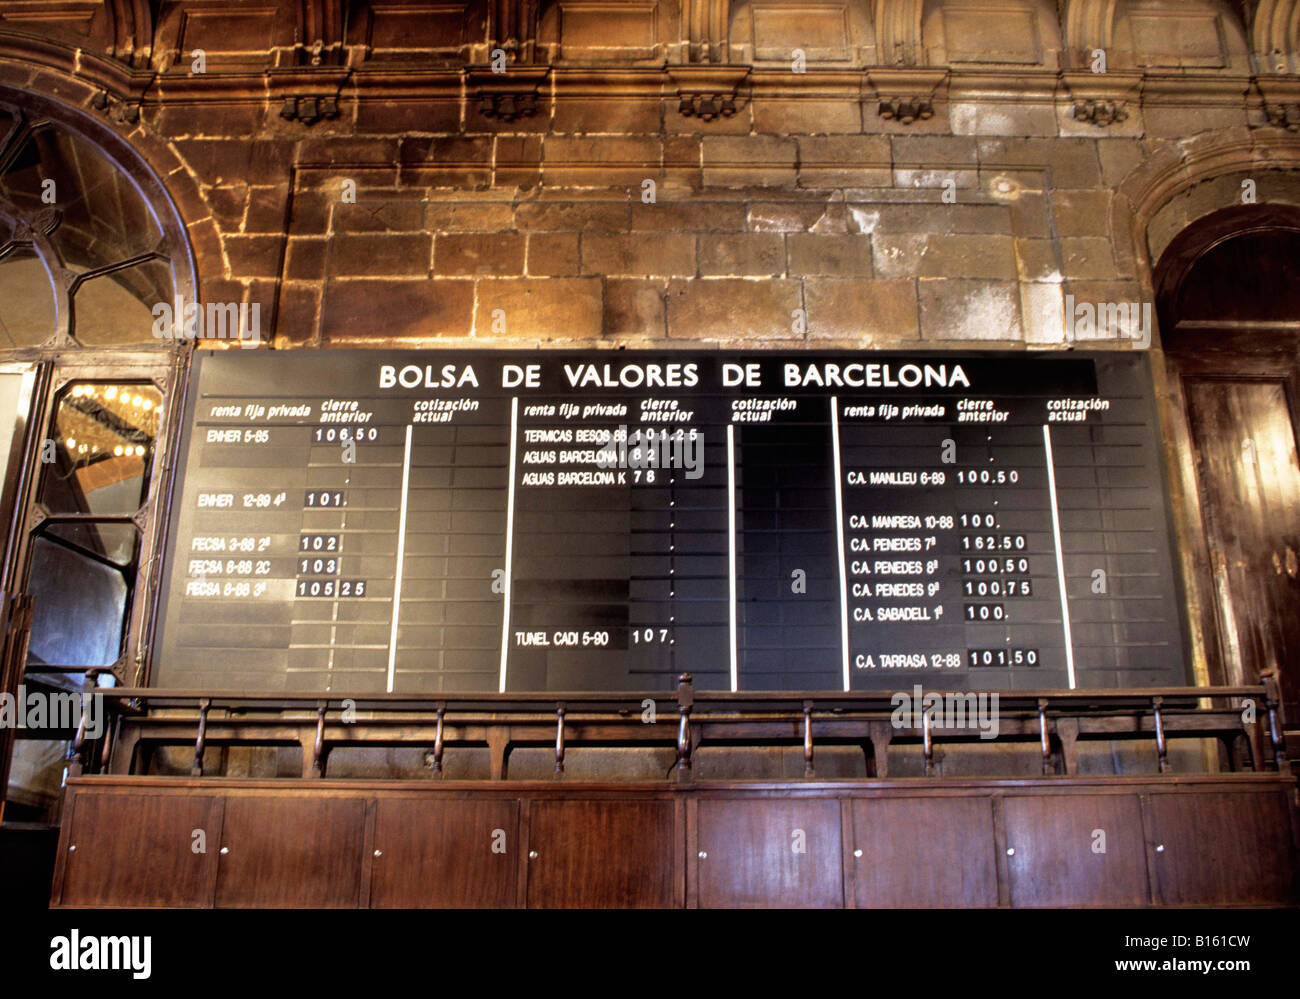 Spain Barcelona La Llotja Palace of Barcelona Old Stock Exchange - Stock Image